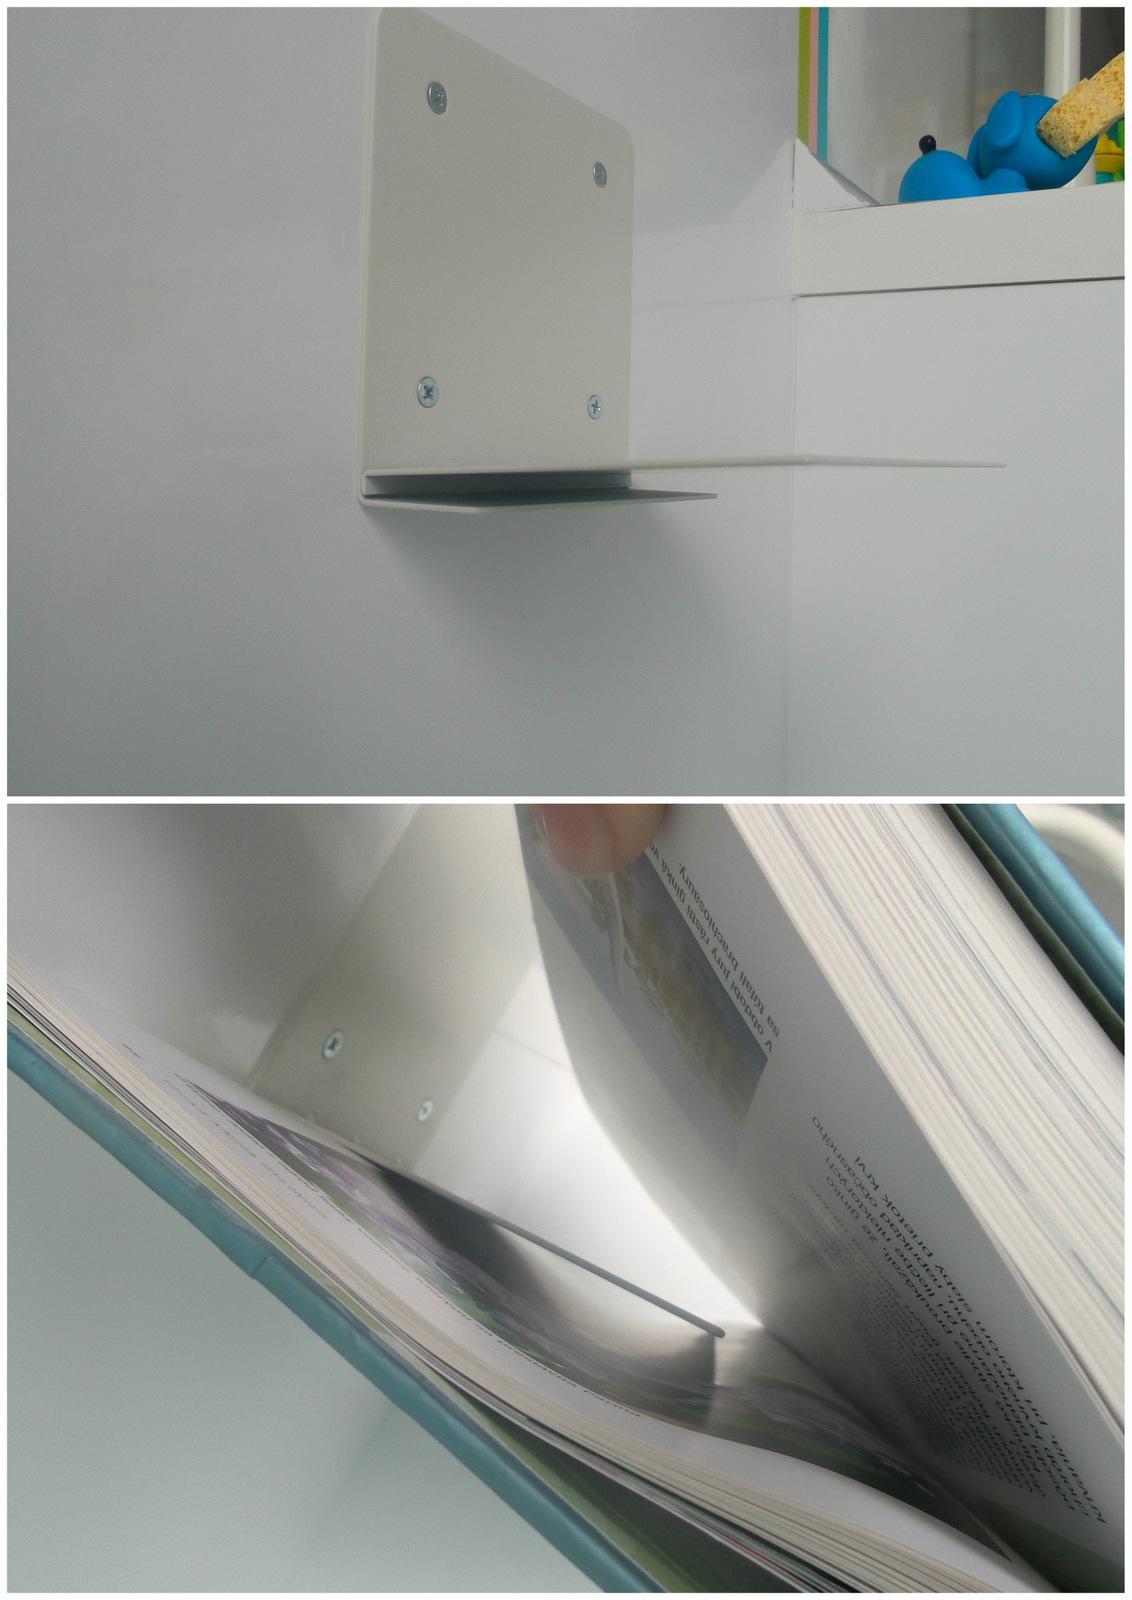 D☼m@ - pre @katka.24 detail ako drzia knihy